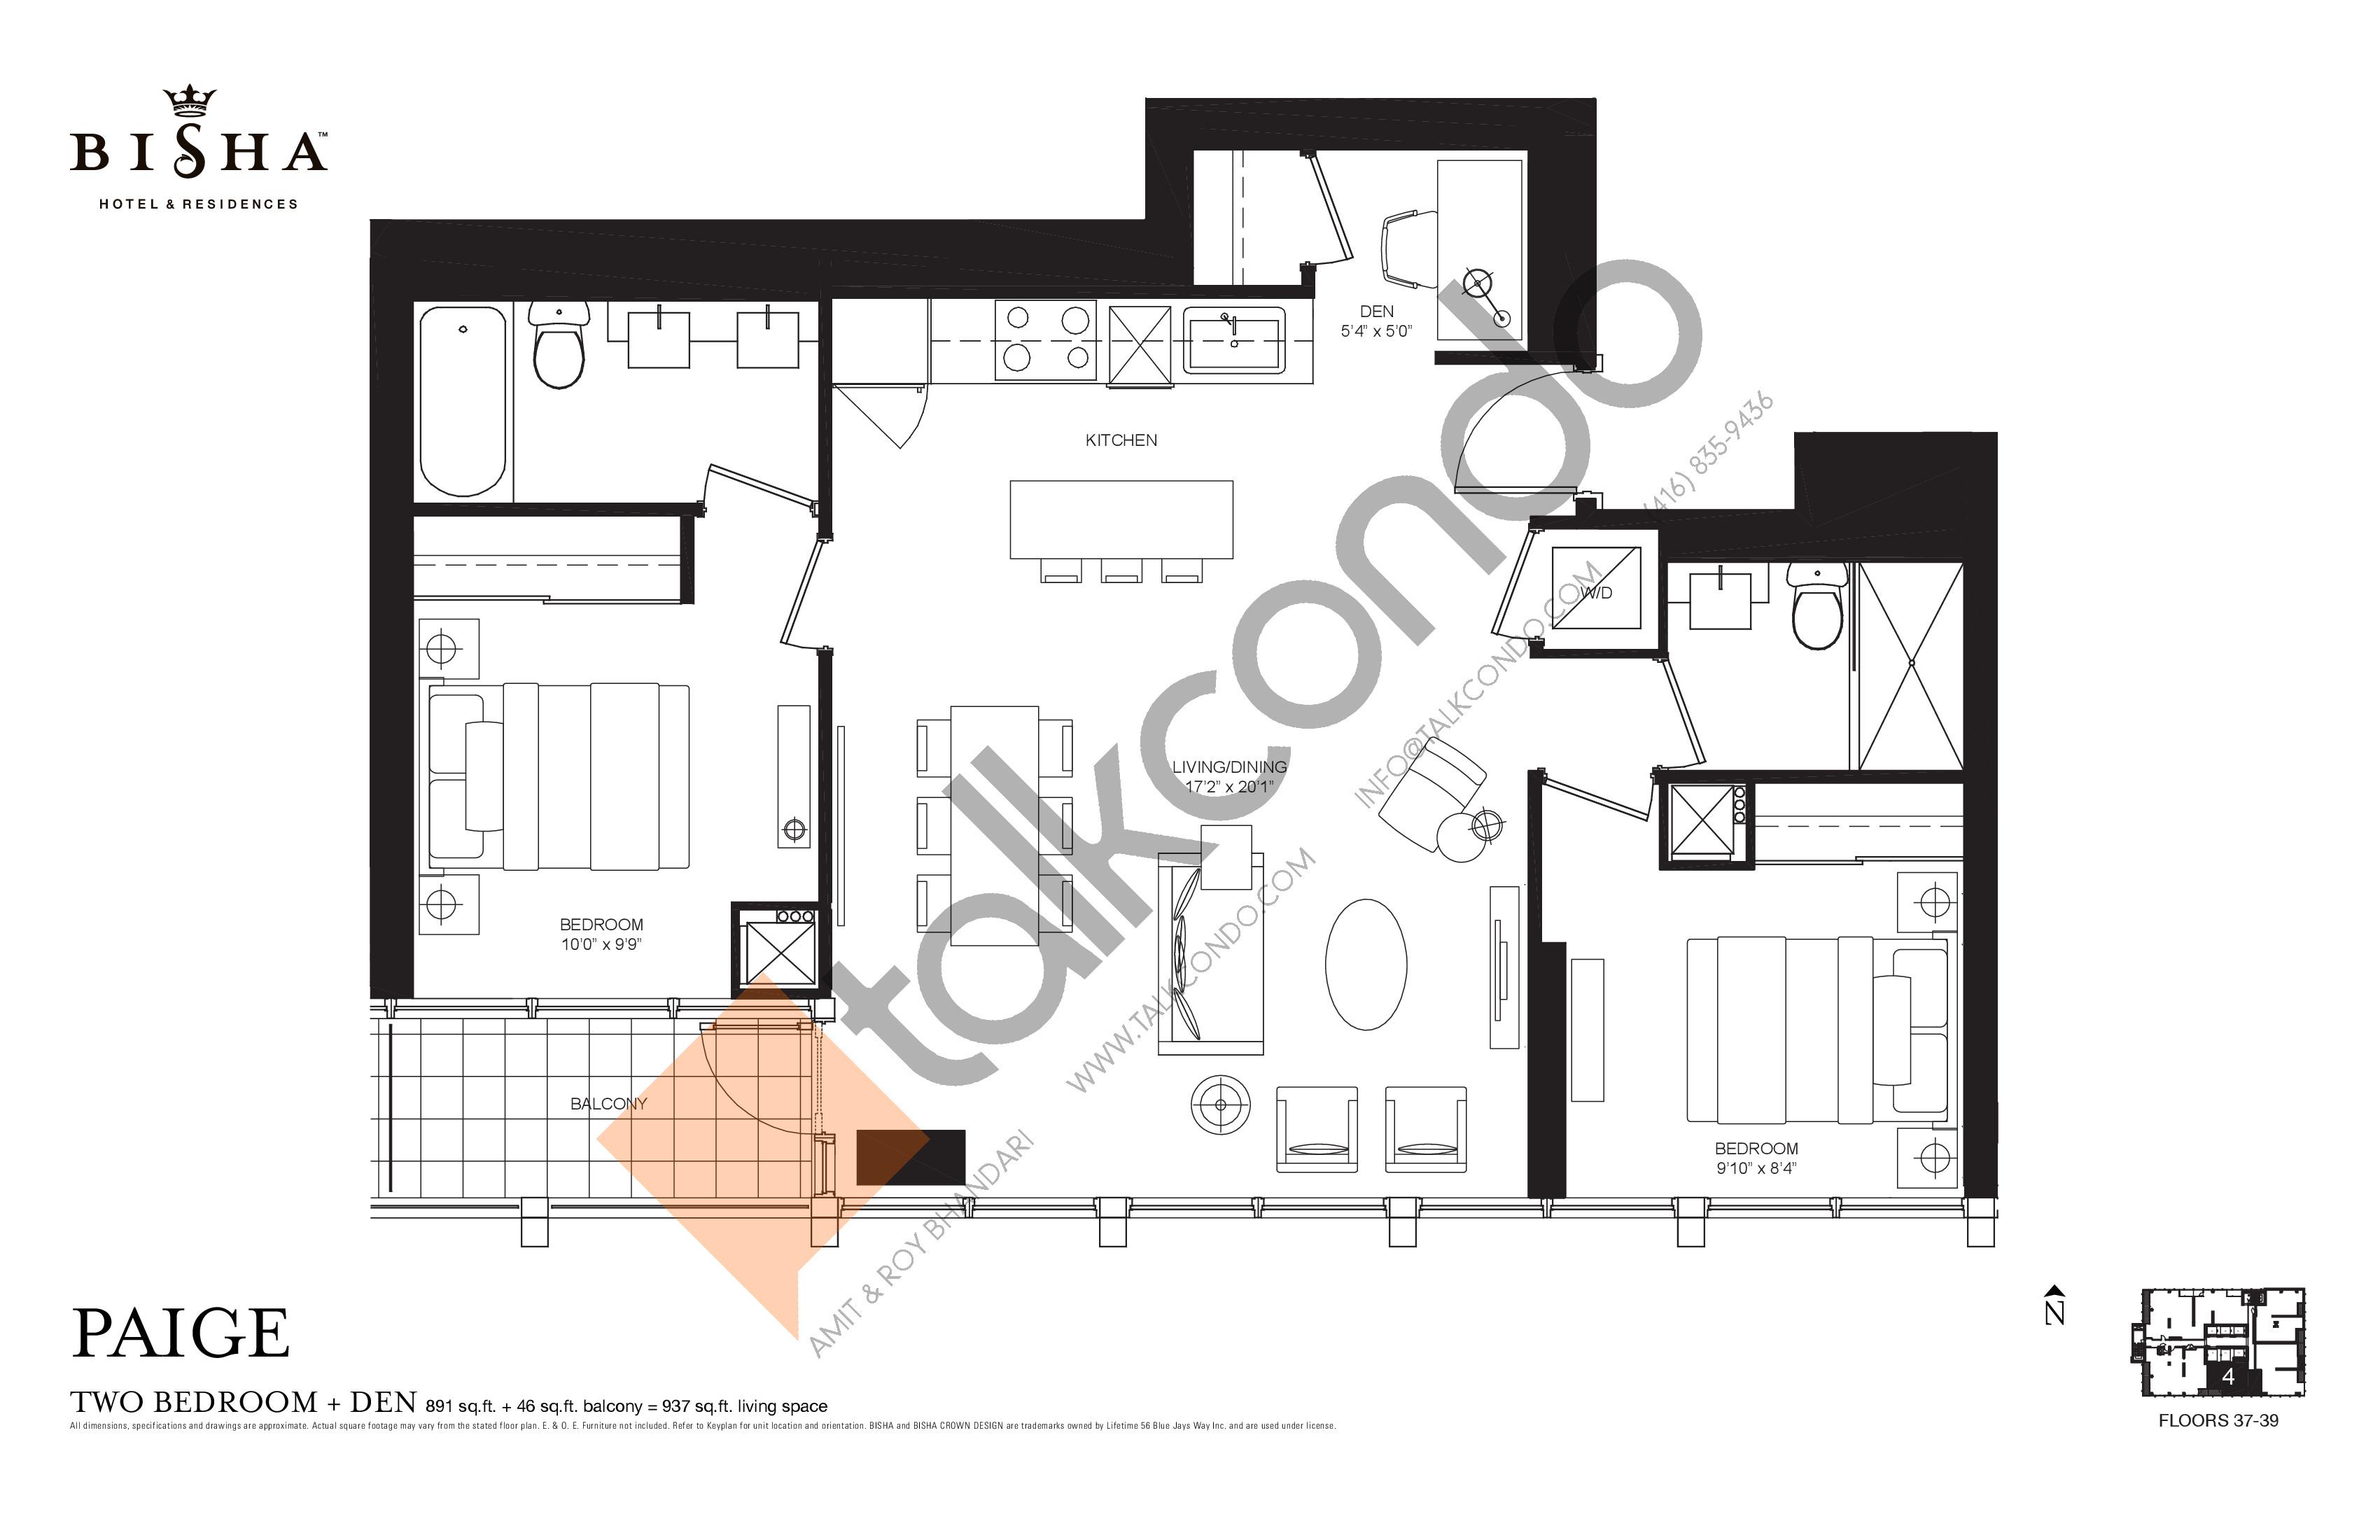 Bisha Hotel Residences Condos Floor Plans Prices Availability Talkcondo